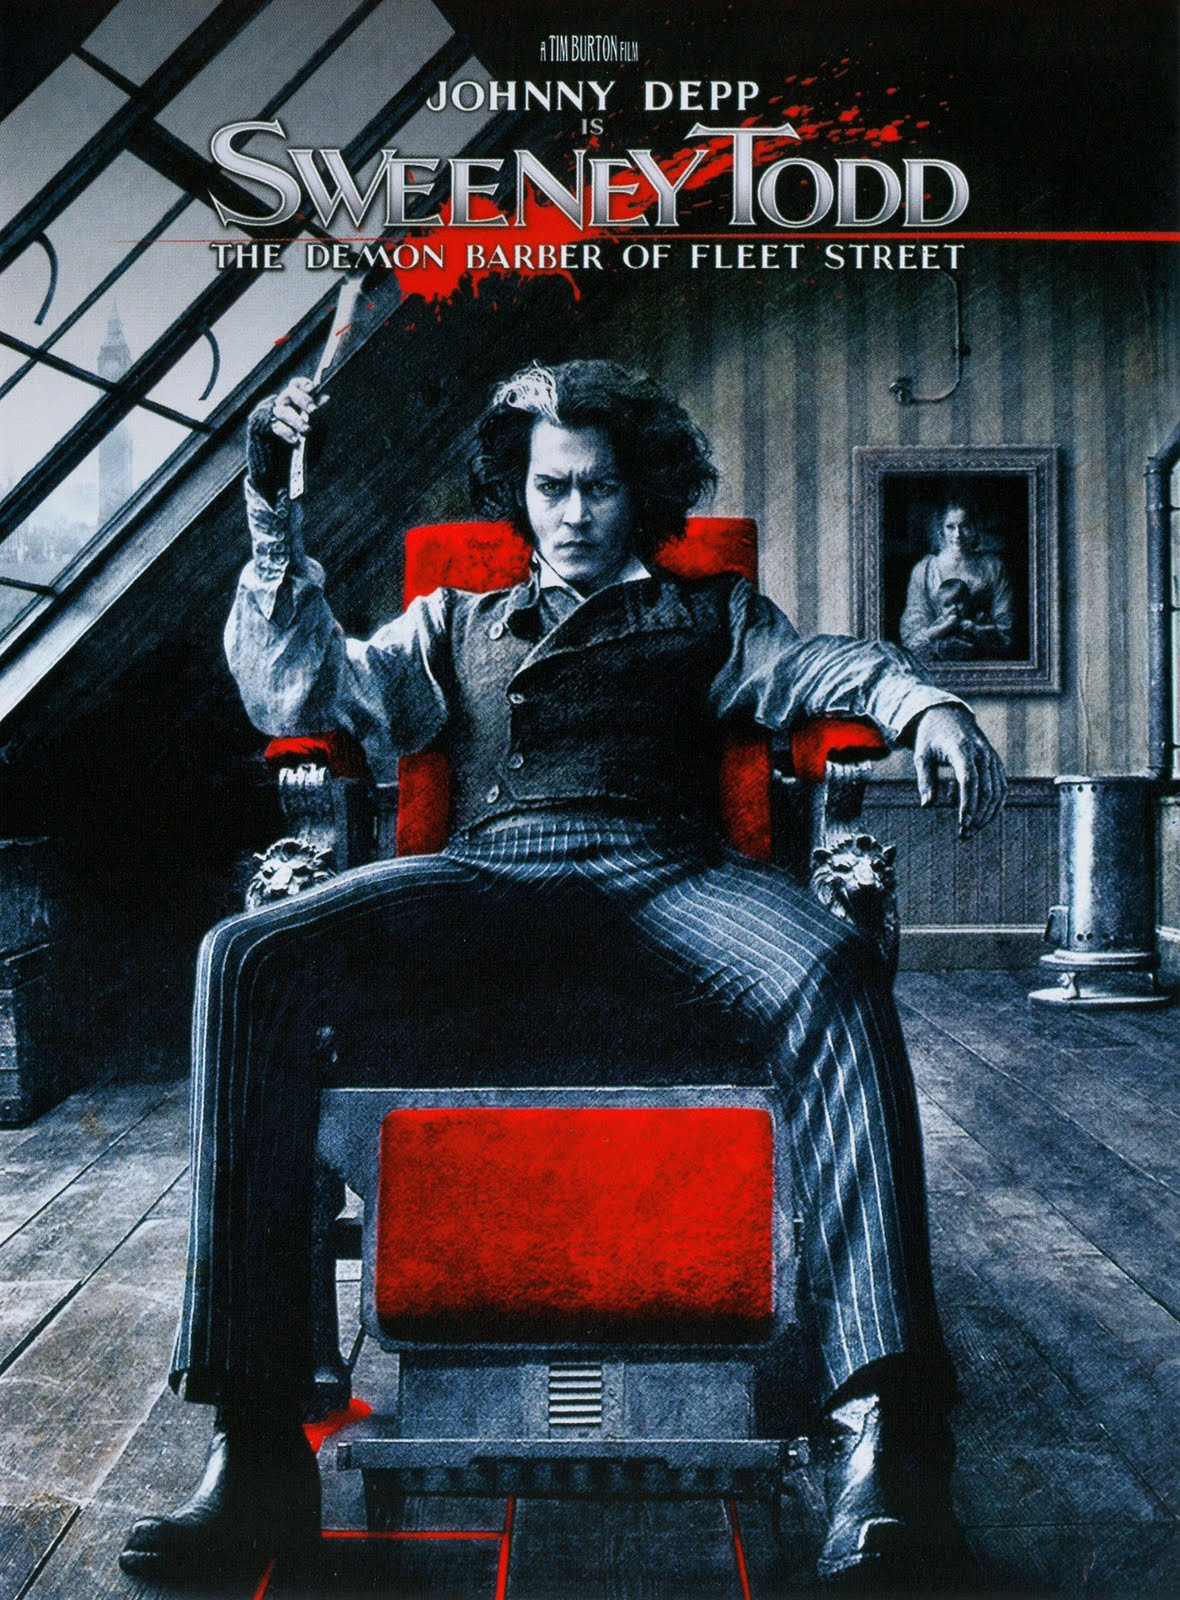 http://2.bp.blogspot.com/_W3bLkLDR-6o/TPU0nJaW1oI/AAAAAAAAJbk/5ePCE2DXvDI/s1600/Sweeney_Todd_The_Demon_Barber_Of_Fleet_Street_2-disc_Special_Edition.jpg